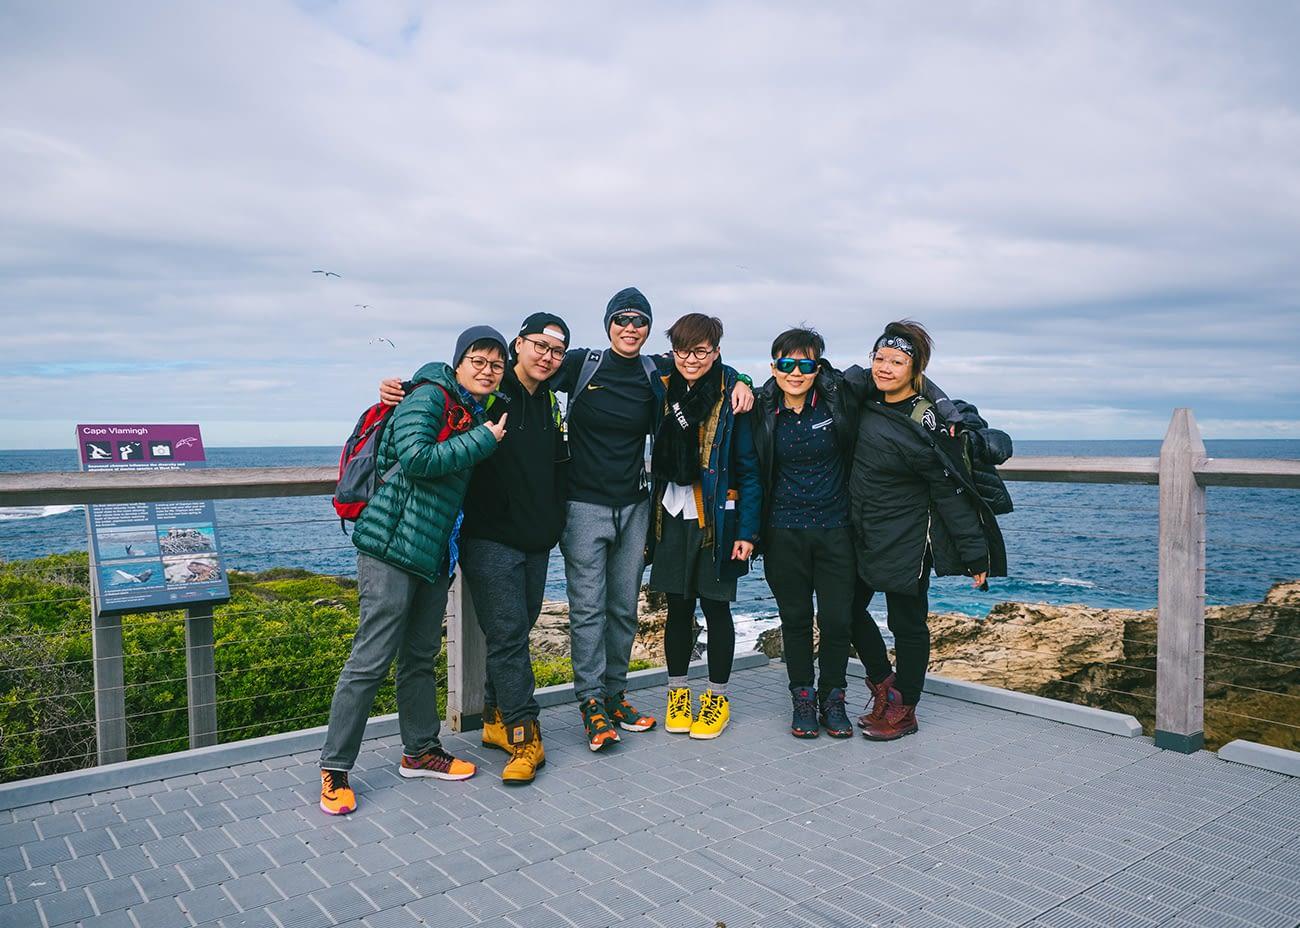 Australia - Rottnest Island - Cape Vlamingh Coastline groupshot